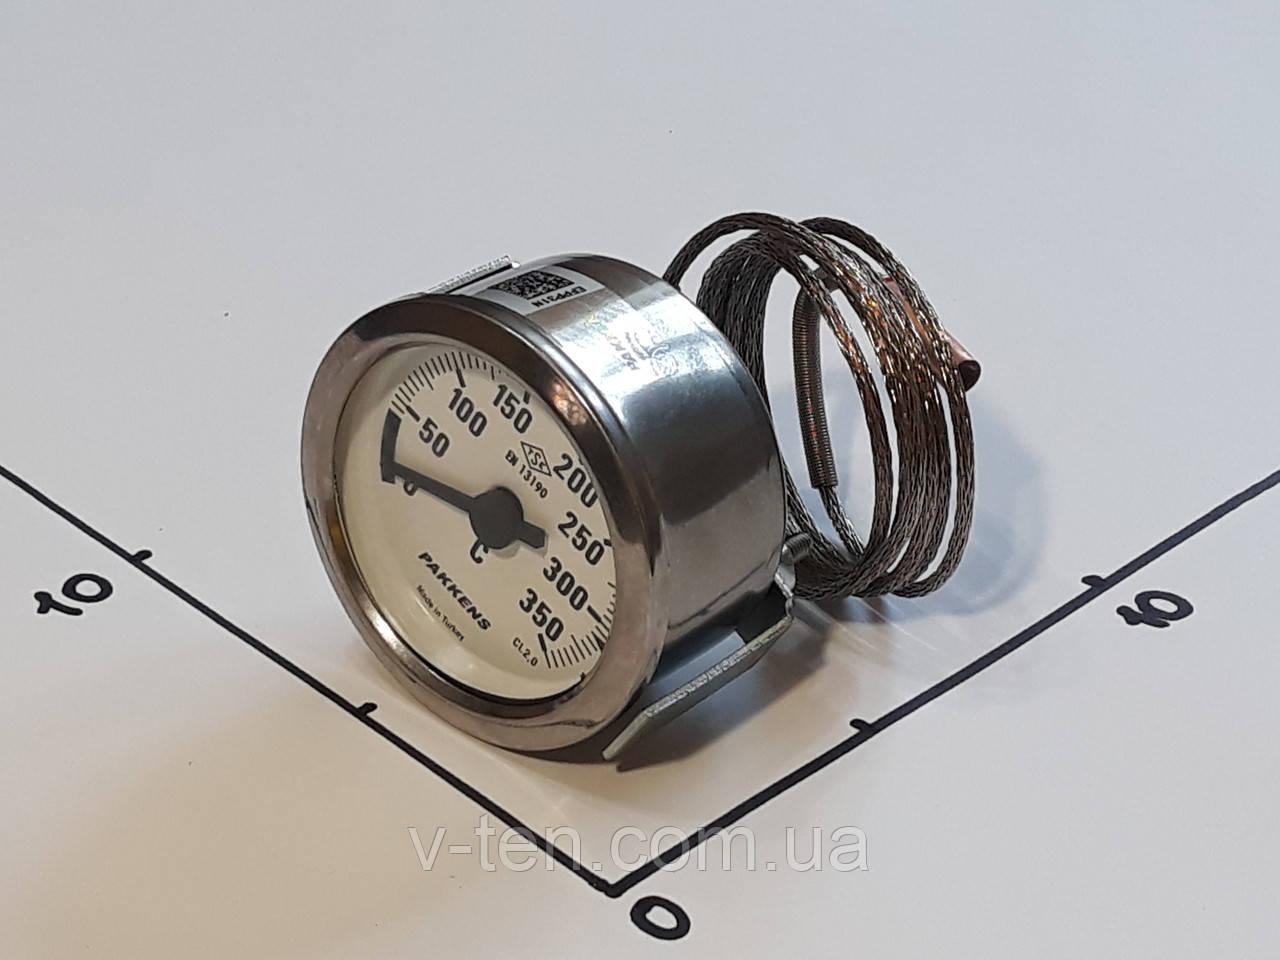 Термометр Ø60мм / 350°С / L-100 cм капиллярный PAKKENS (Турция)